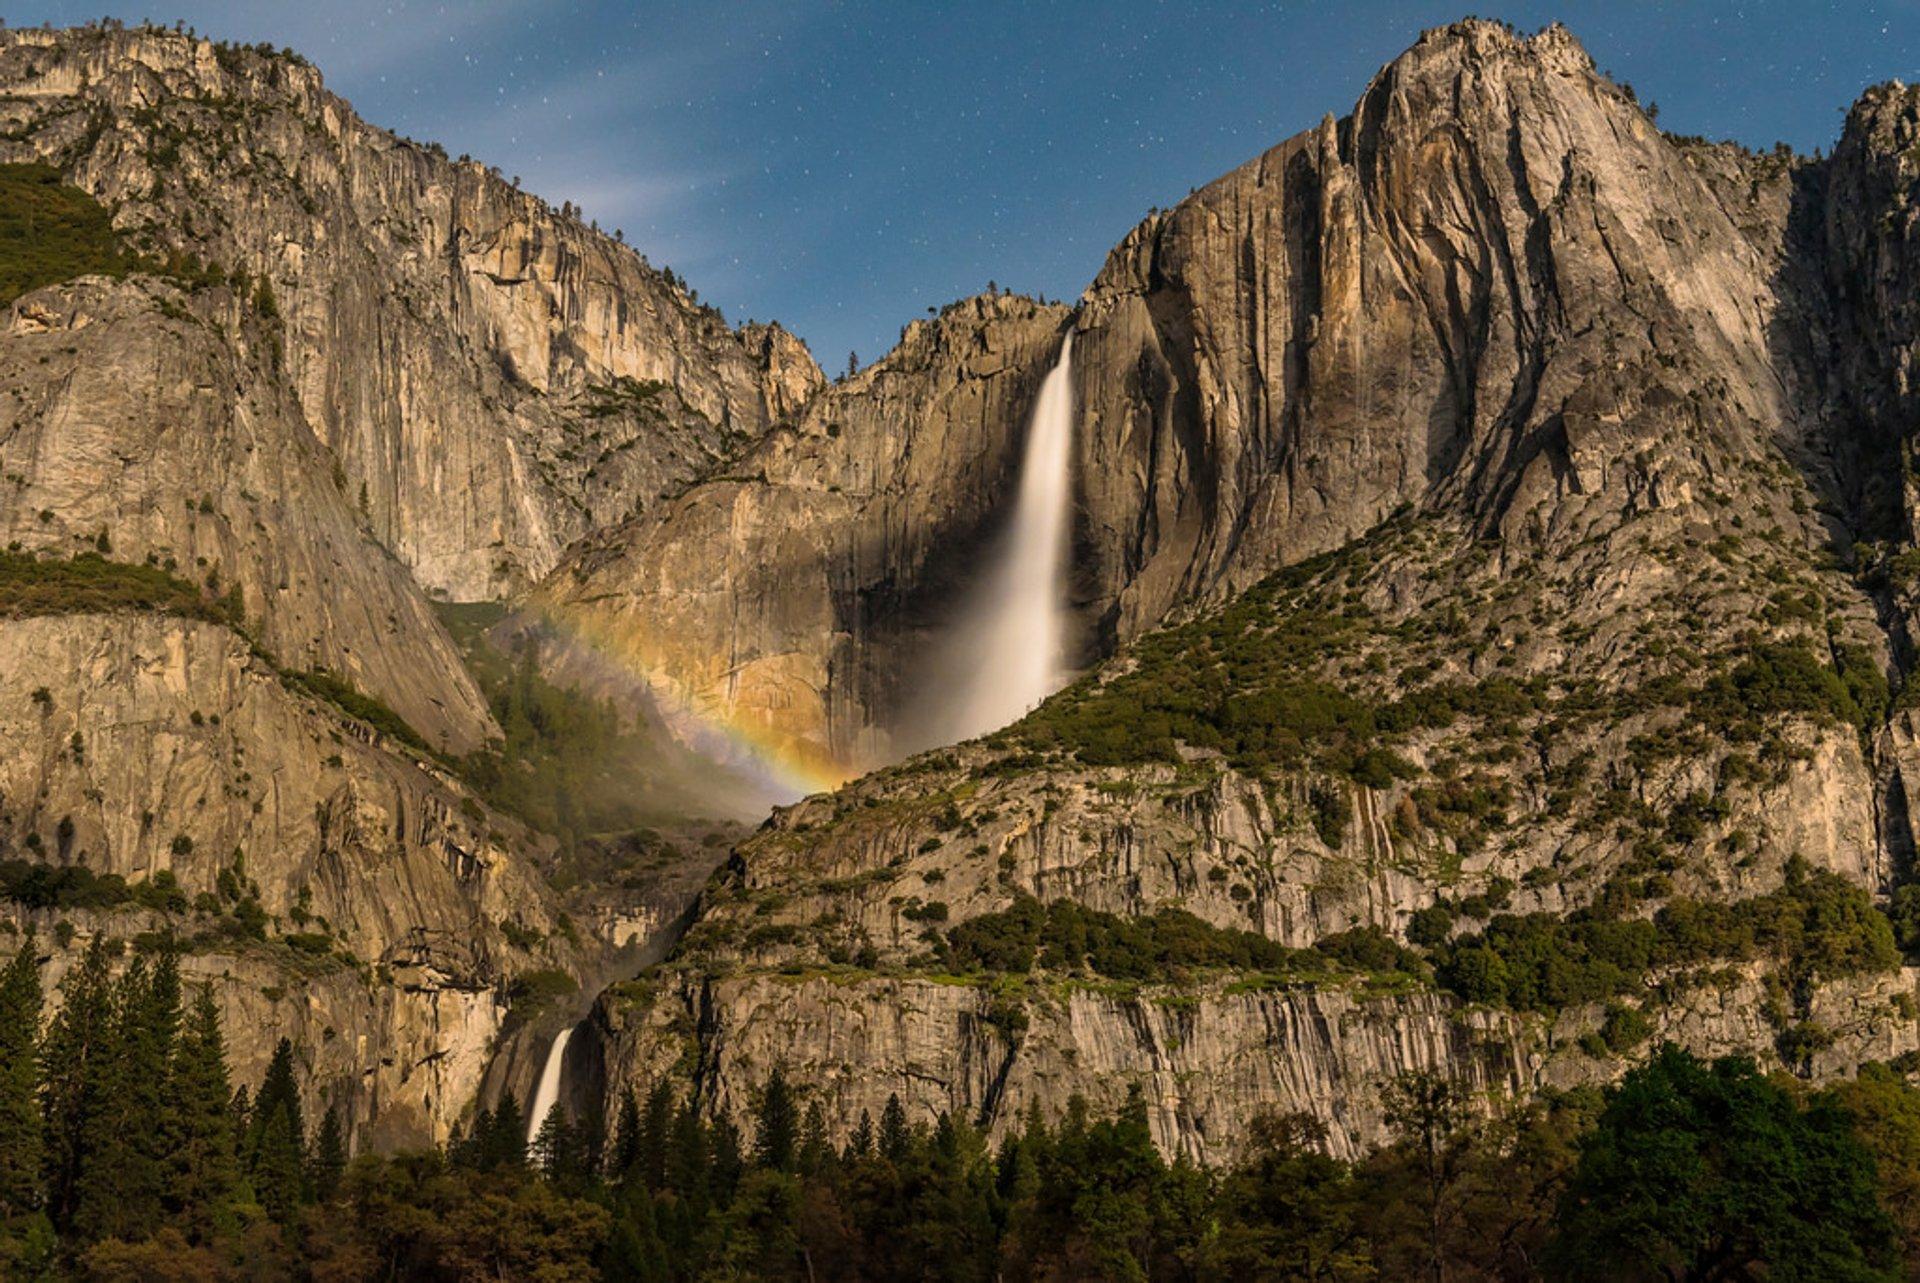 Moonbows in Yosemite 2020 - Best Time